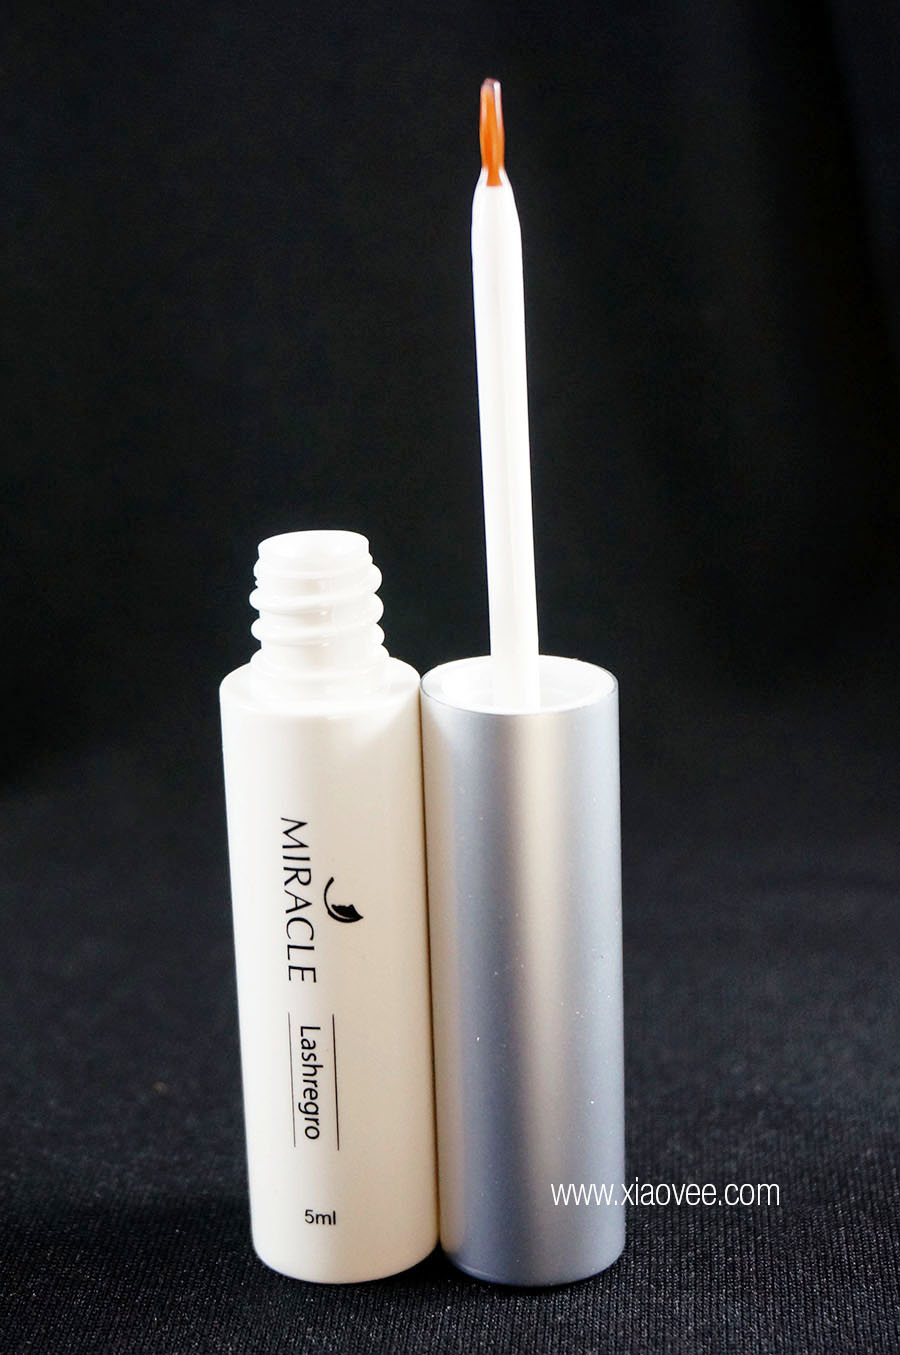 Miracle Lashregro review, serum untuk mempercepat pertumbuhan bulu mata agar lebih tebal, lentik dan panjang